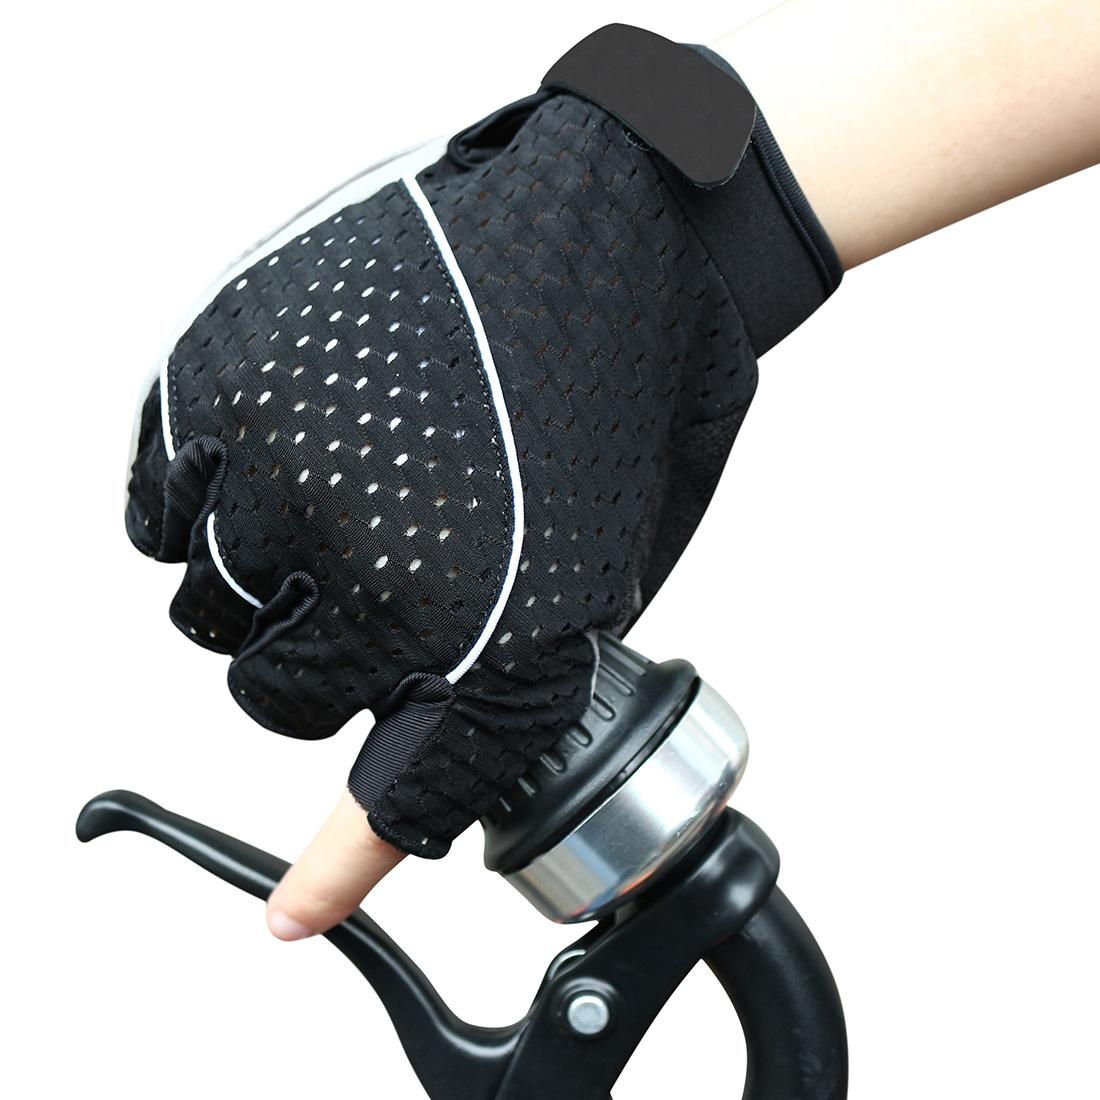 Unique Bargains Unisex Outdoor Bike Riding Cycling Gloves Half Finger Summer Anti-slip